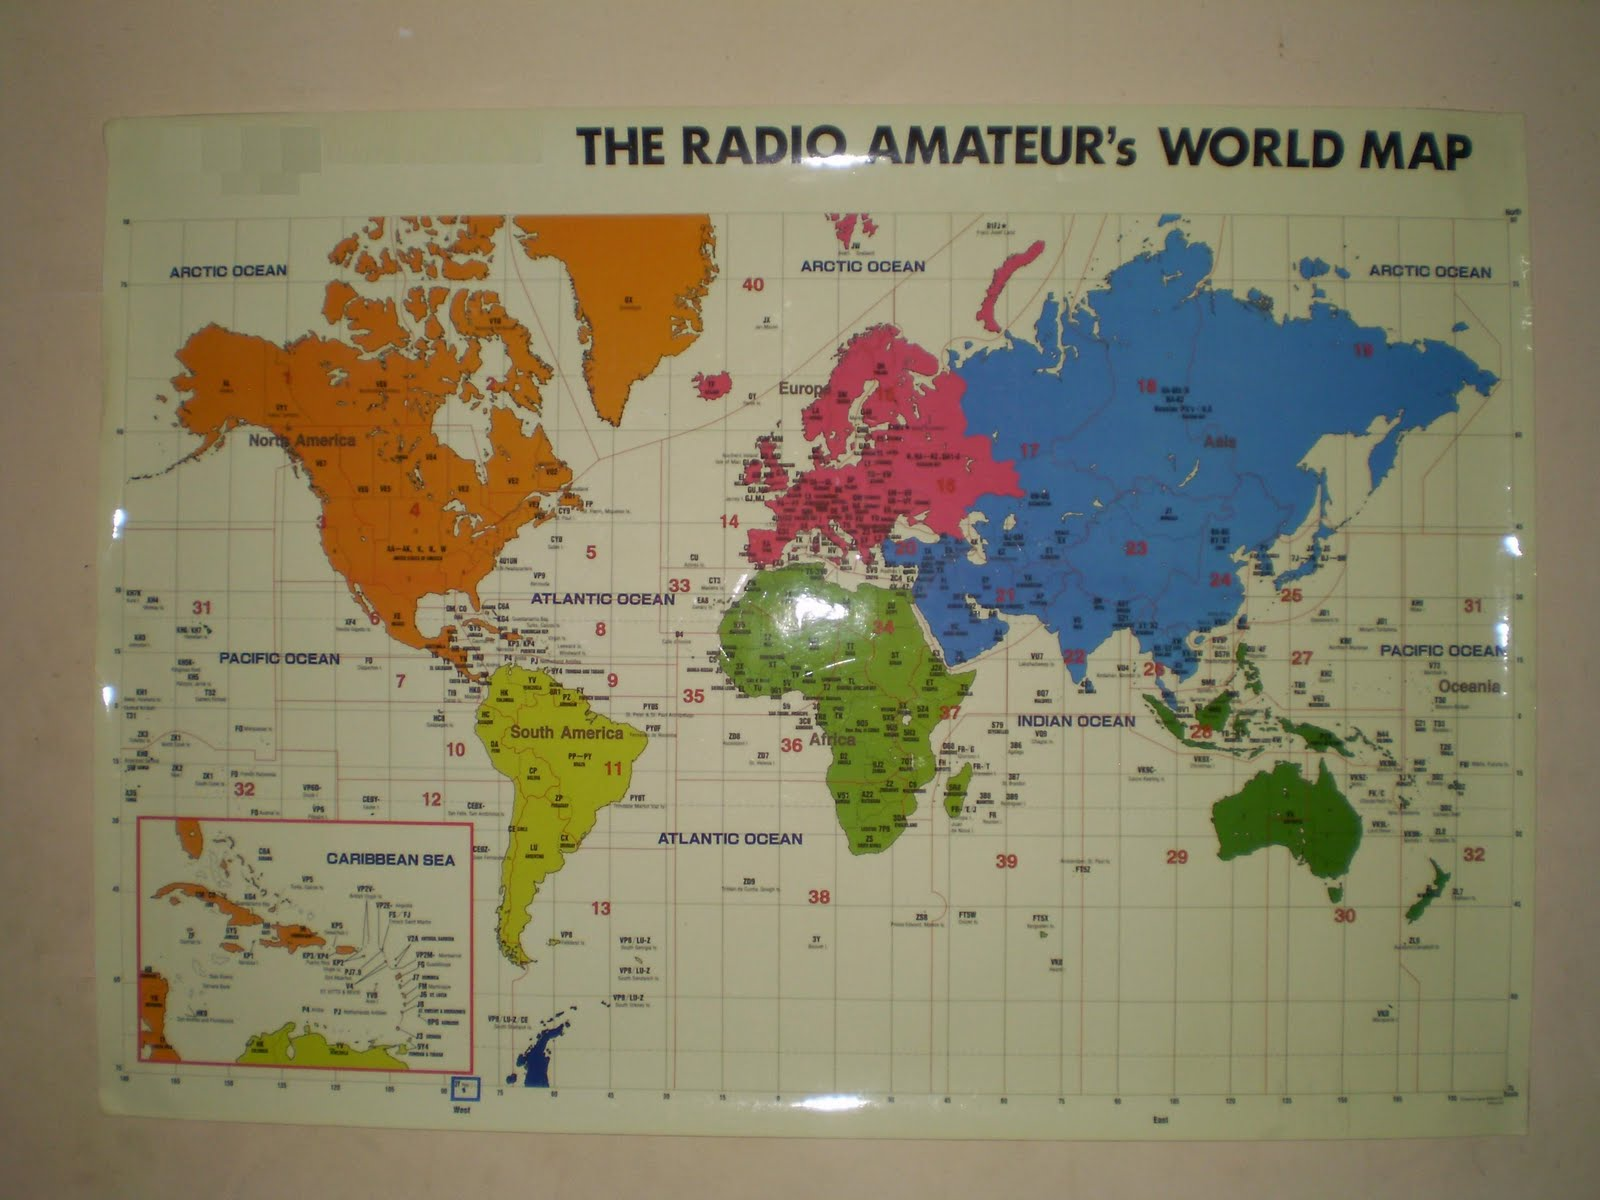 Hameringcom comet antenna nagoya antenna rexon radio aor pw radio amateurs world map gumiabroncs Gallery